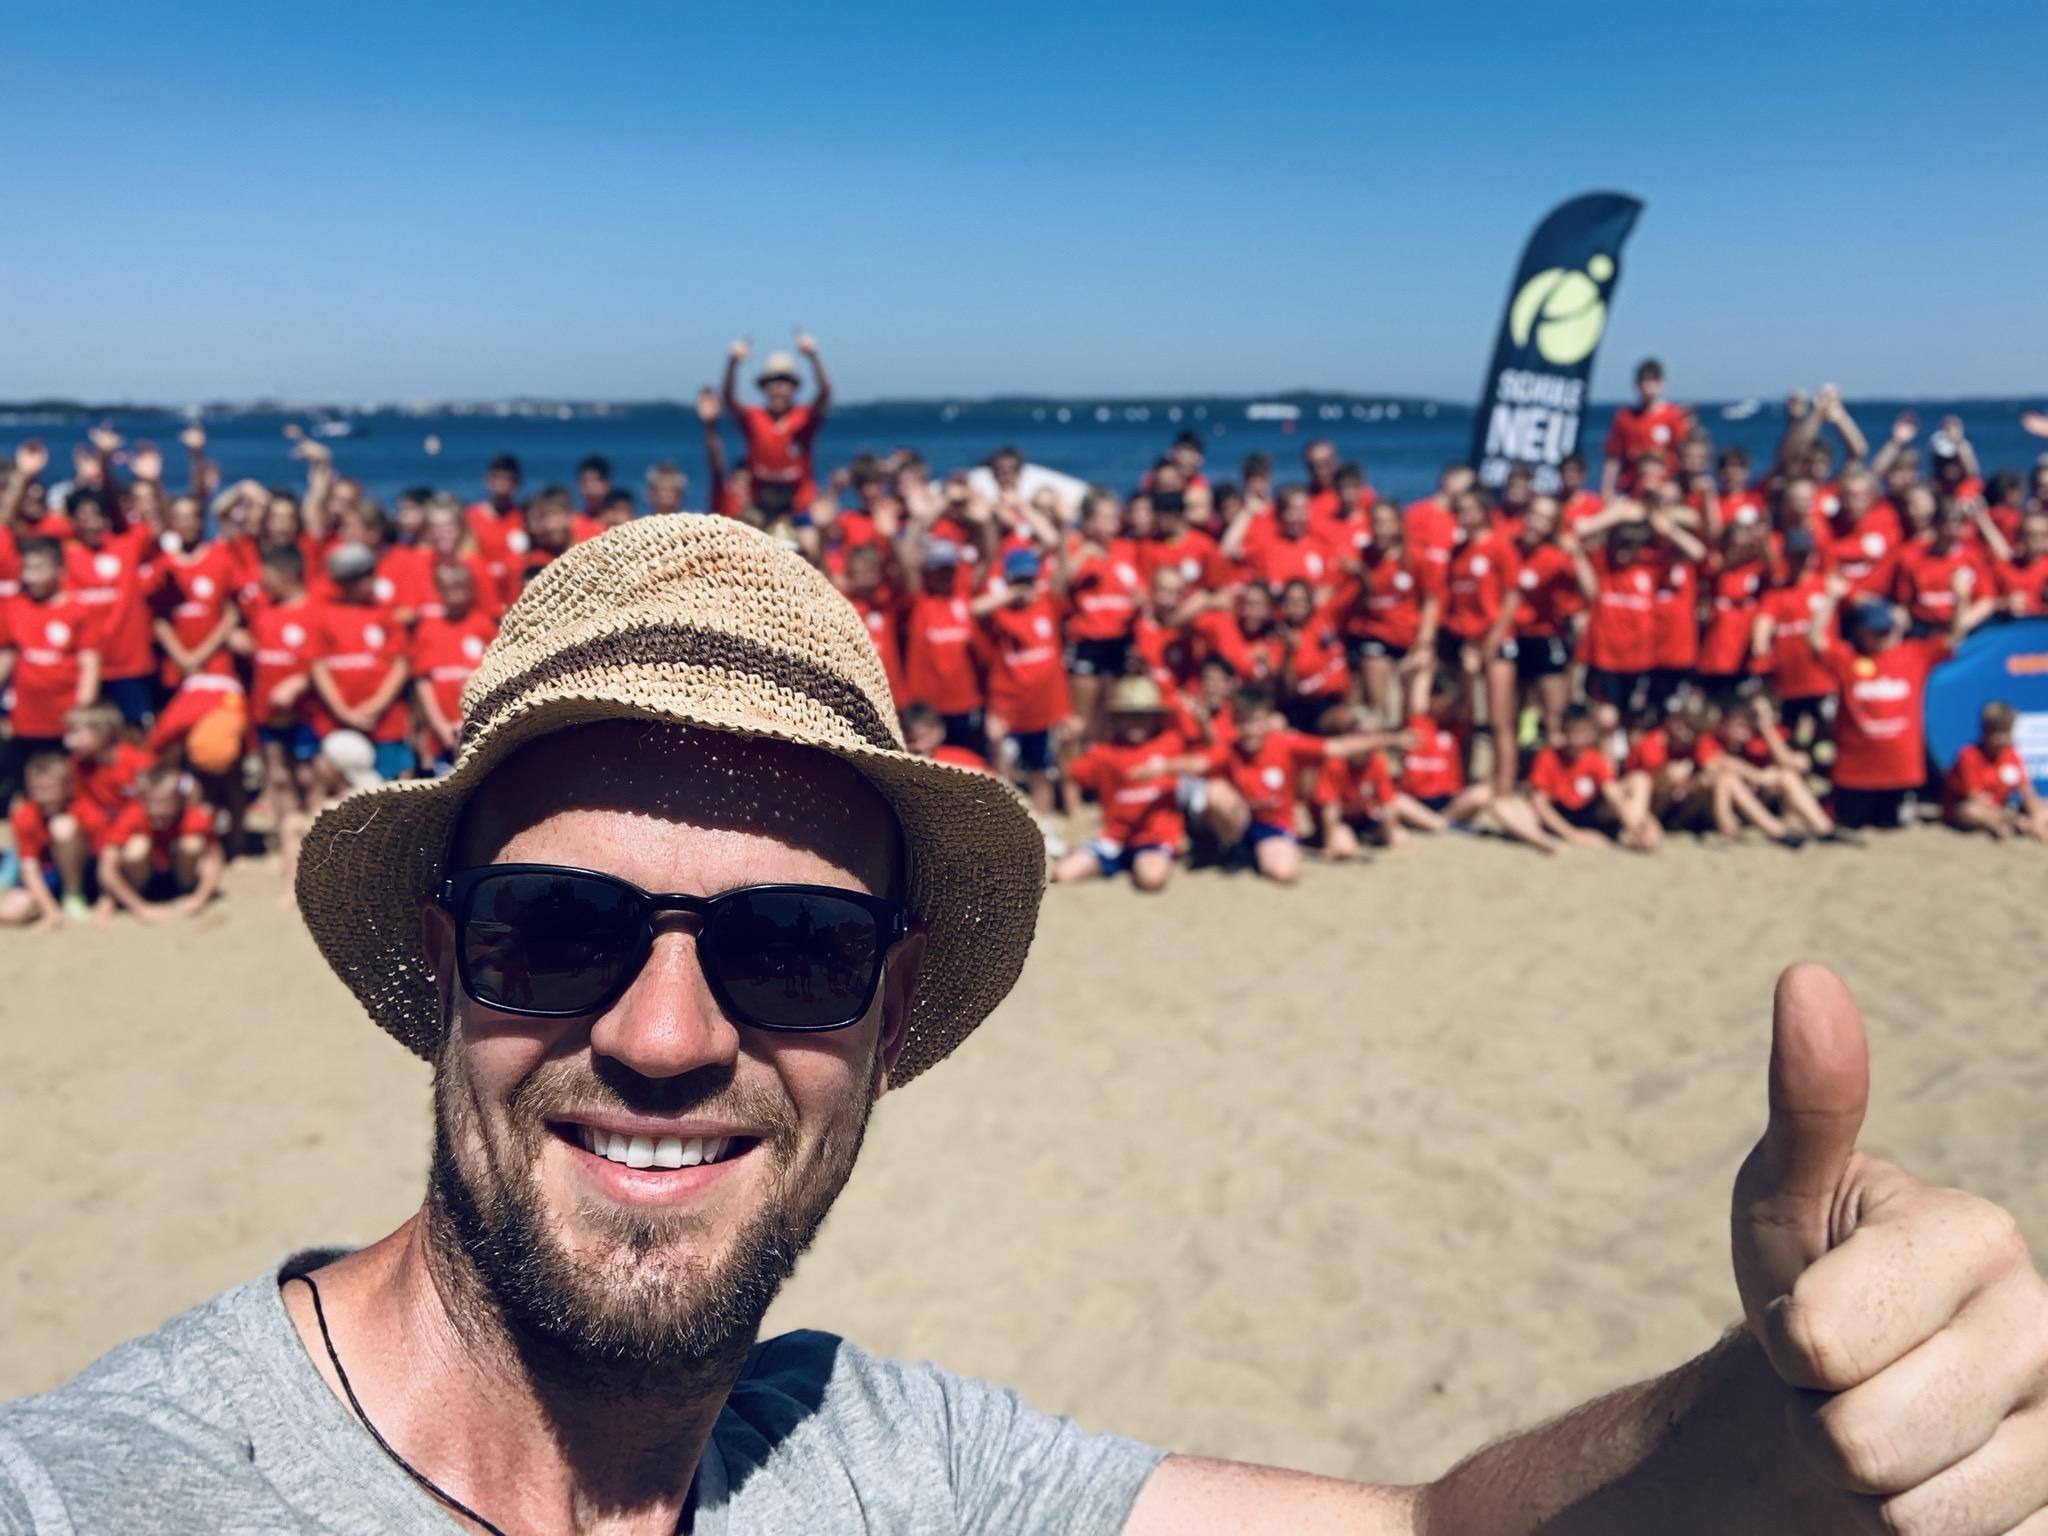 Barracuda Beach Handball Open in Neustadt-Glewe